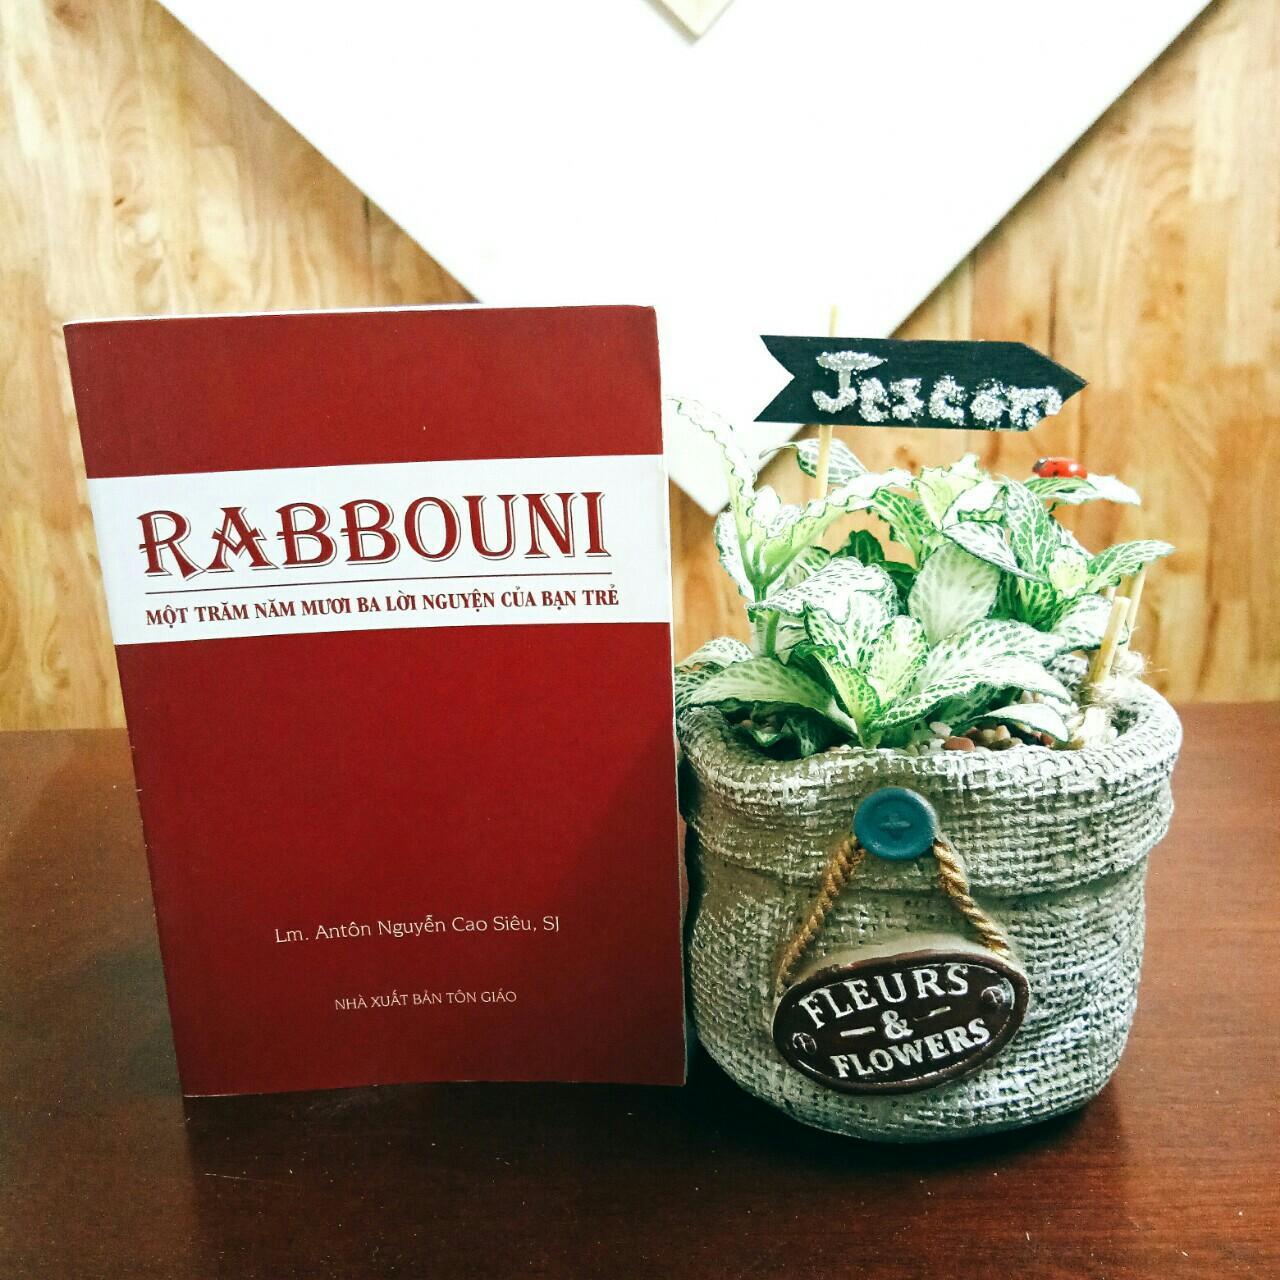 Mua Rabbouni